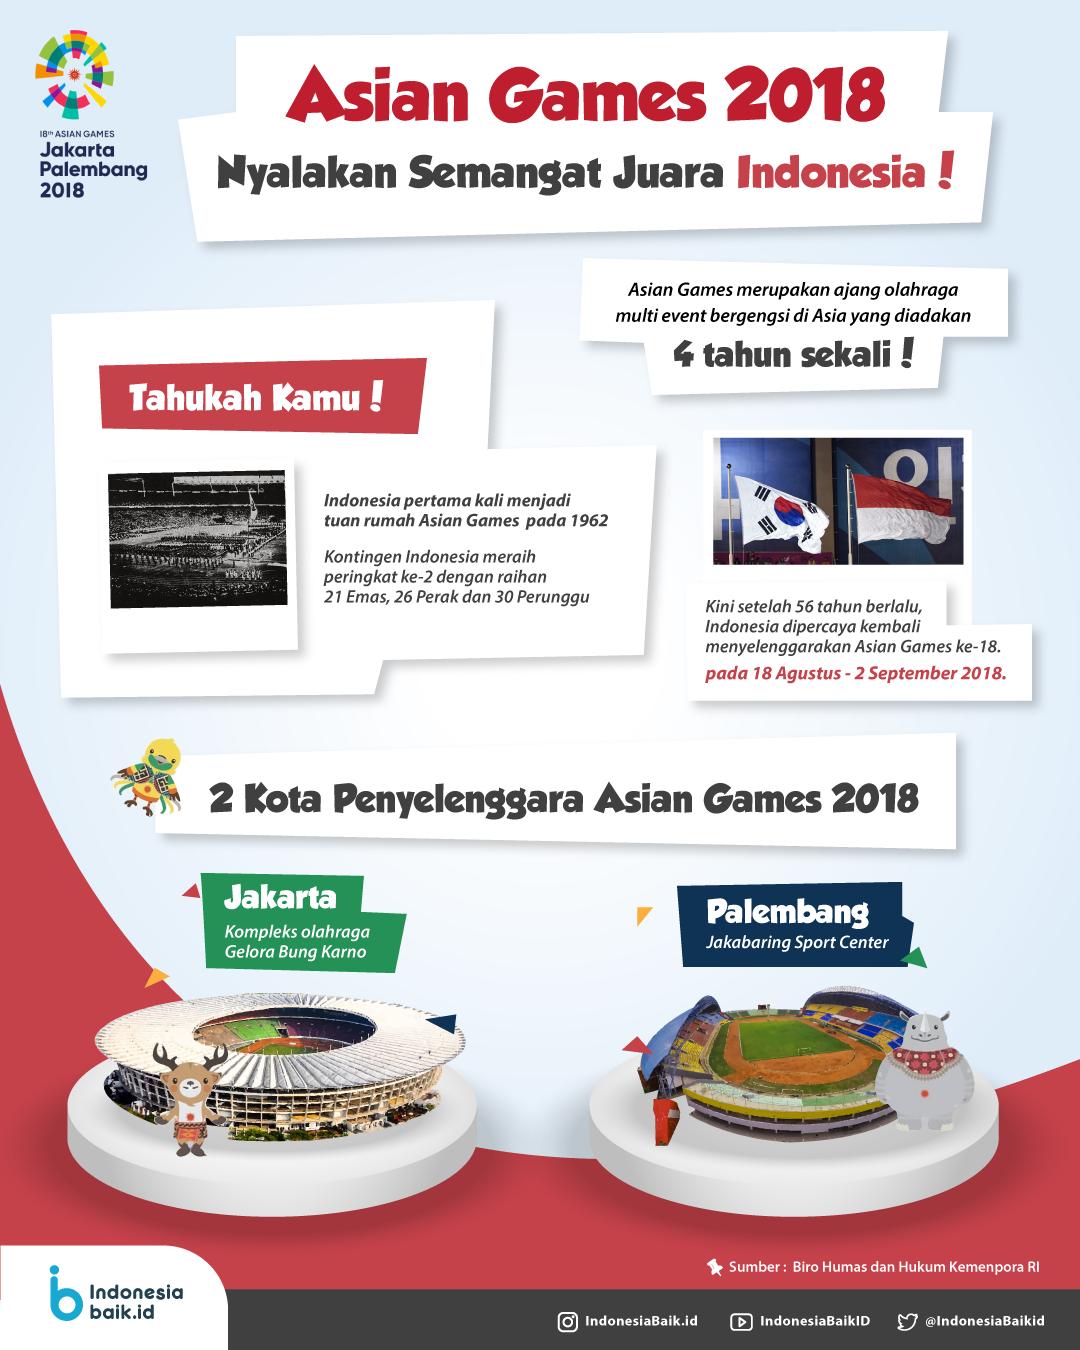 Asian Games 2018! Nyalakan Semangat Juara Indonesia